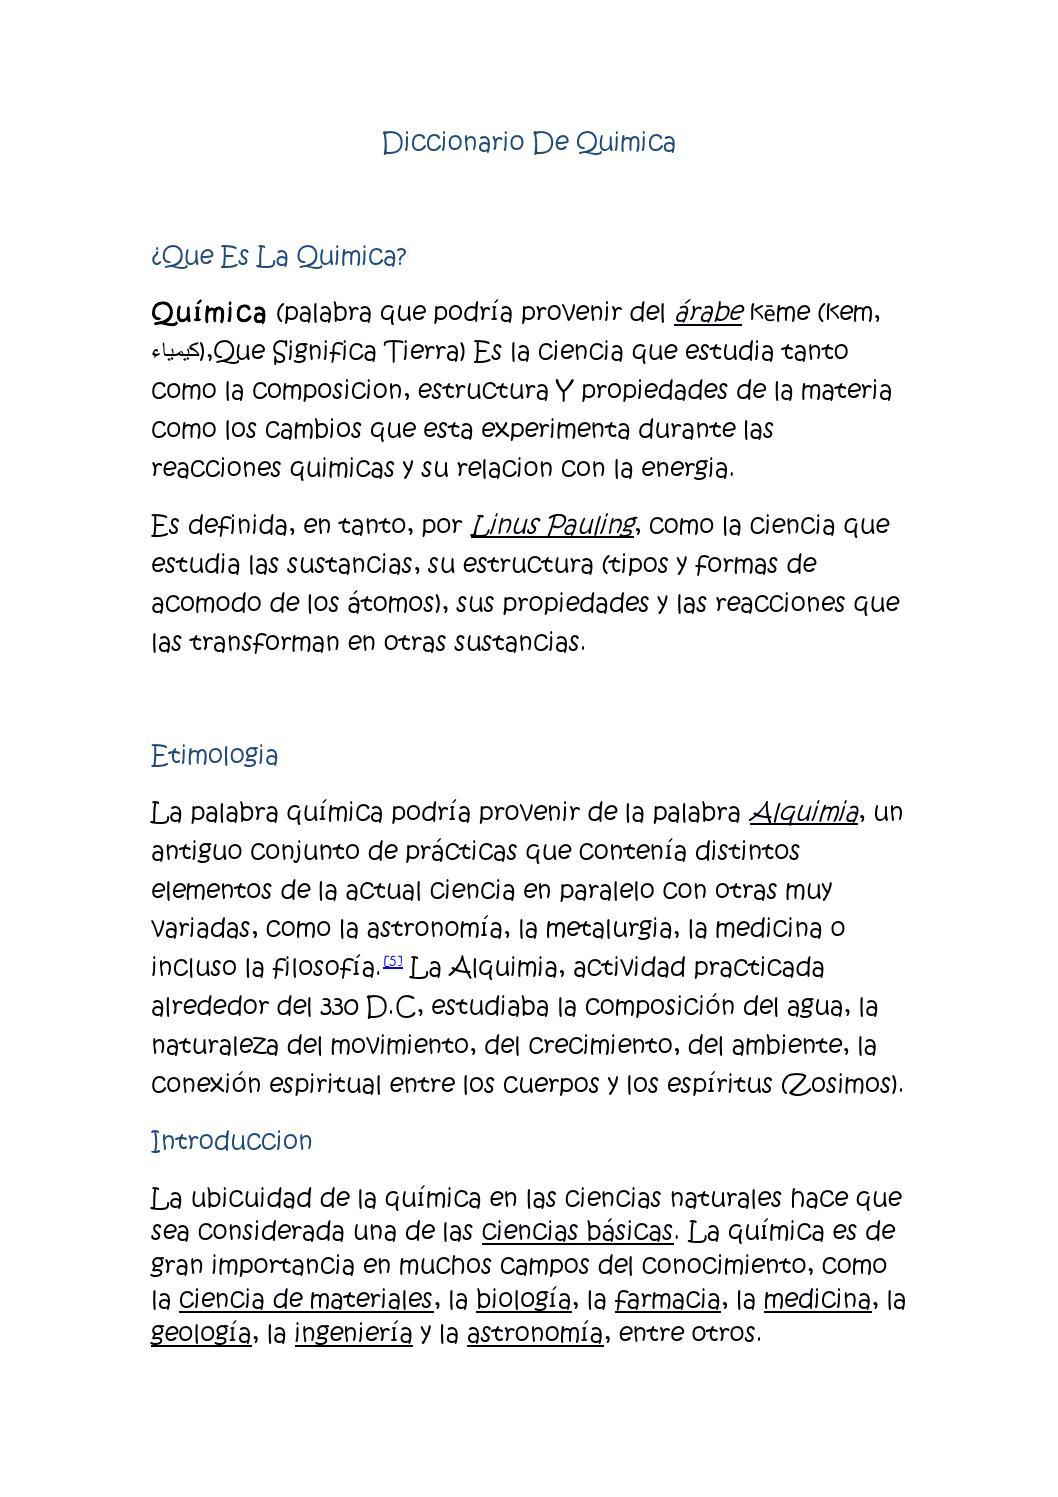 Diccionario De Quimica By Liiz Rpô Issuu